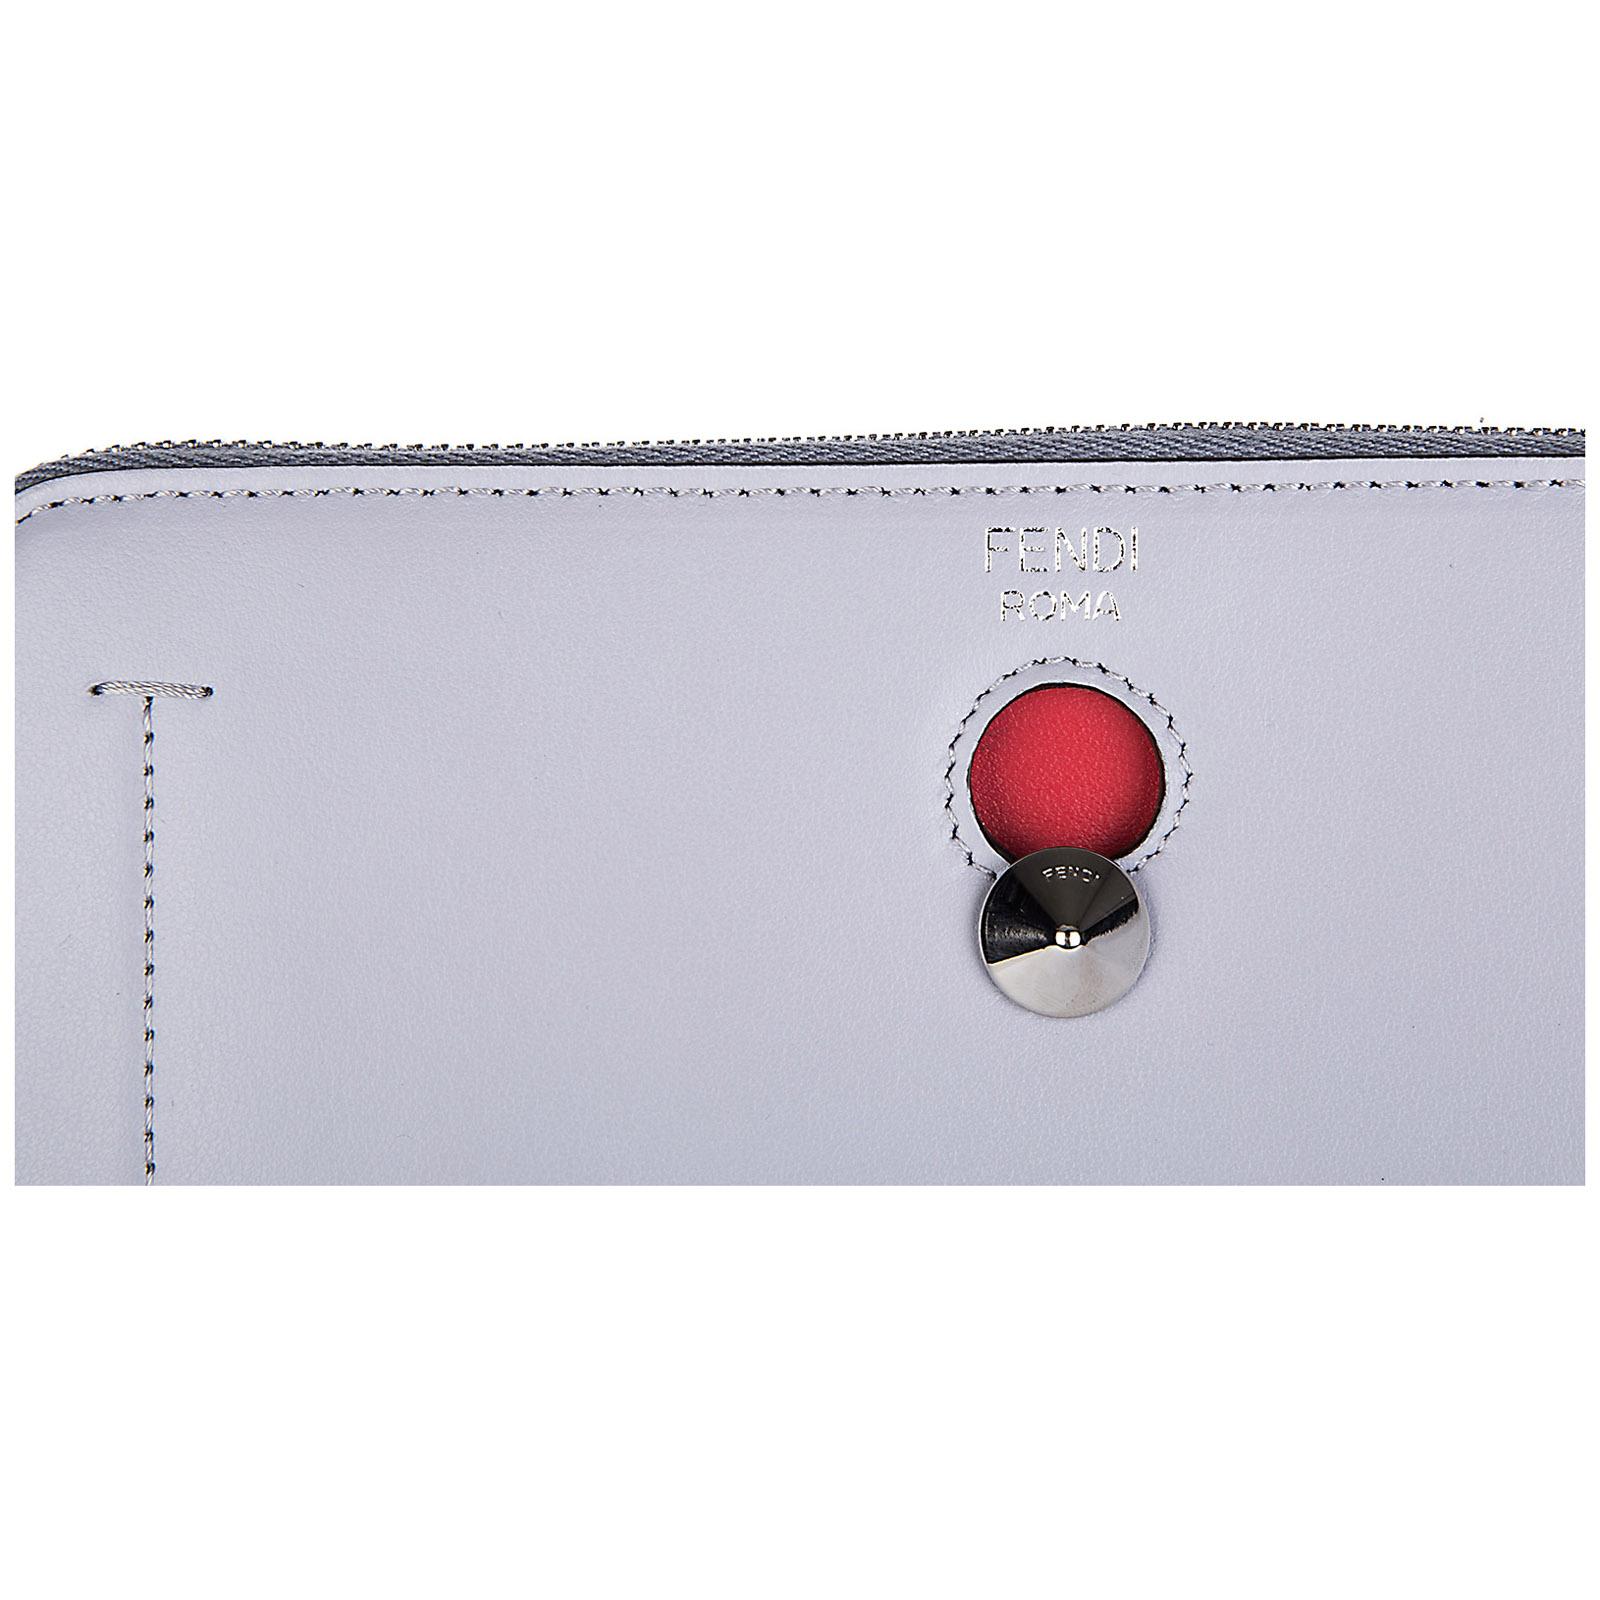 Portefeuille porte-monnaie femme en cuir bifold zip around dotcom